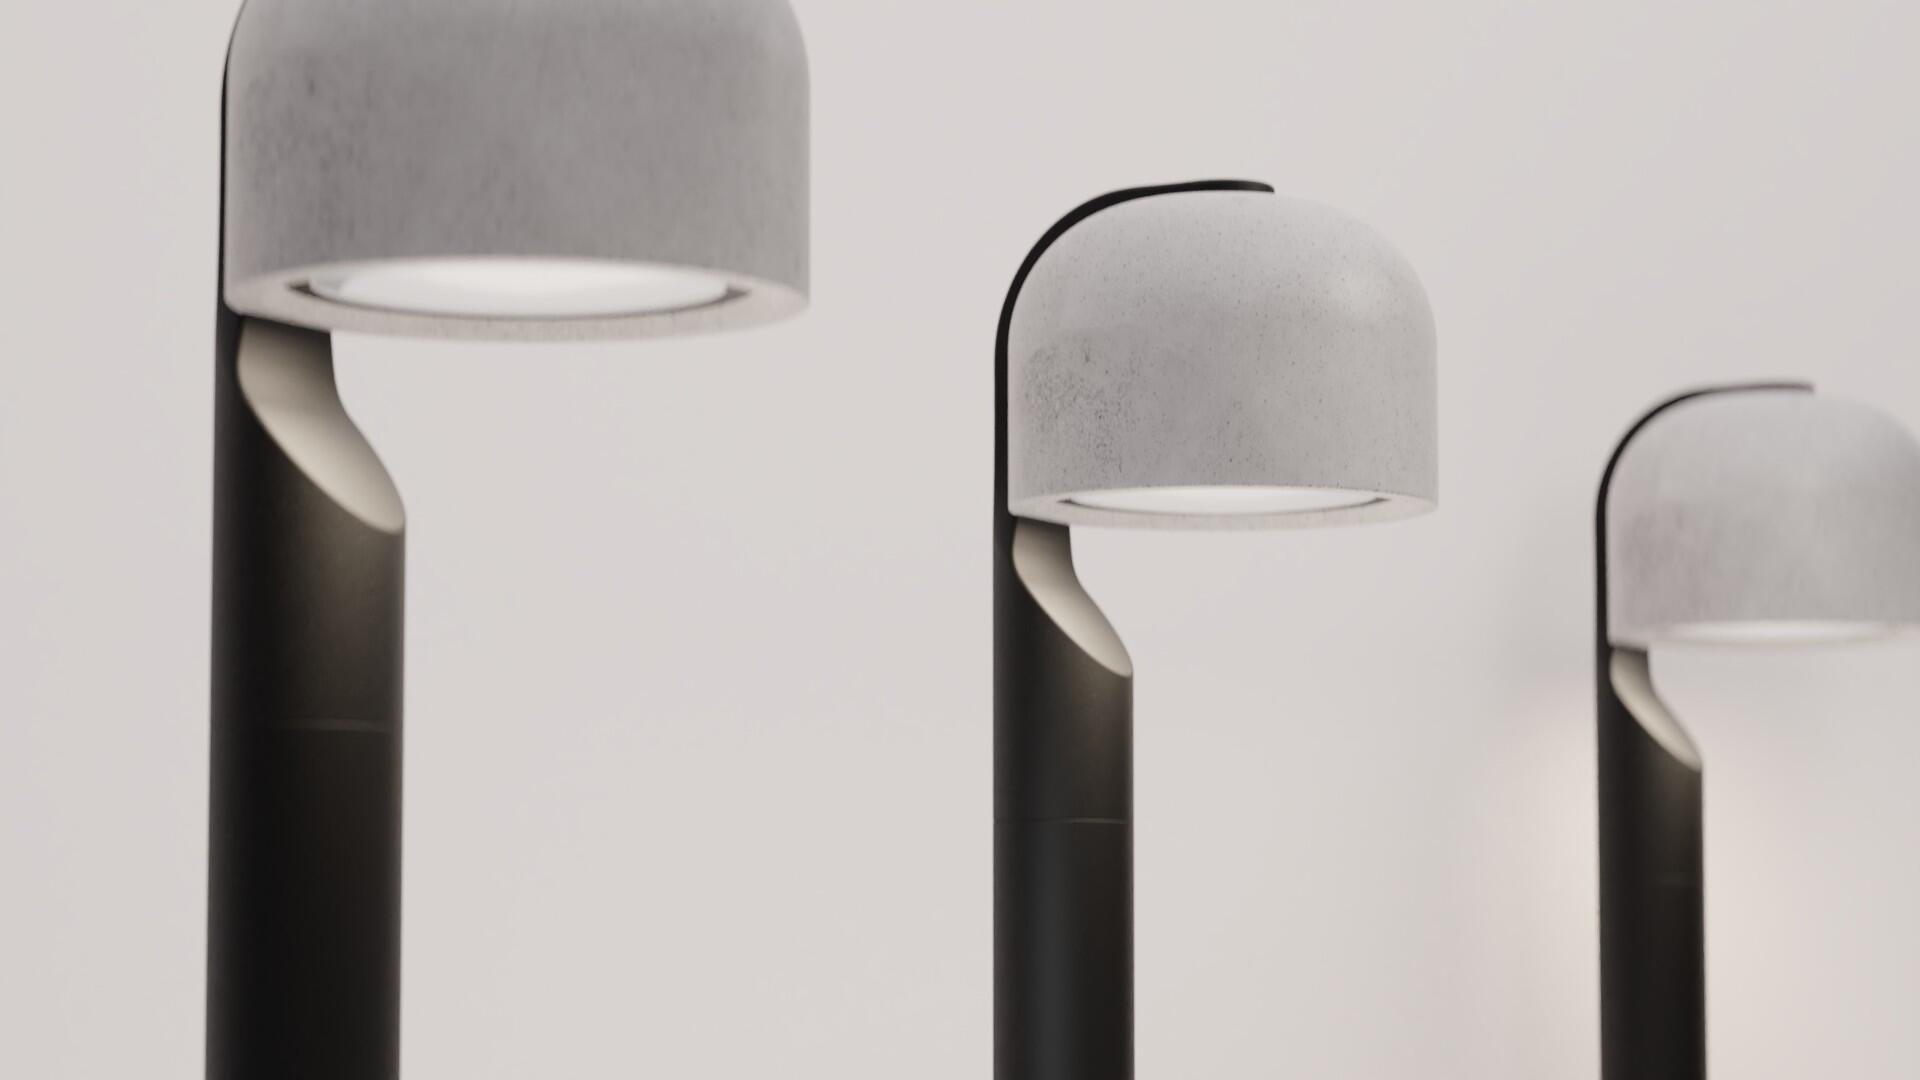 PEBBLE Outdoor Lighting by ALOS. Product Design Studio.